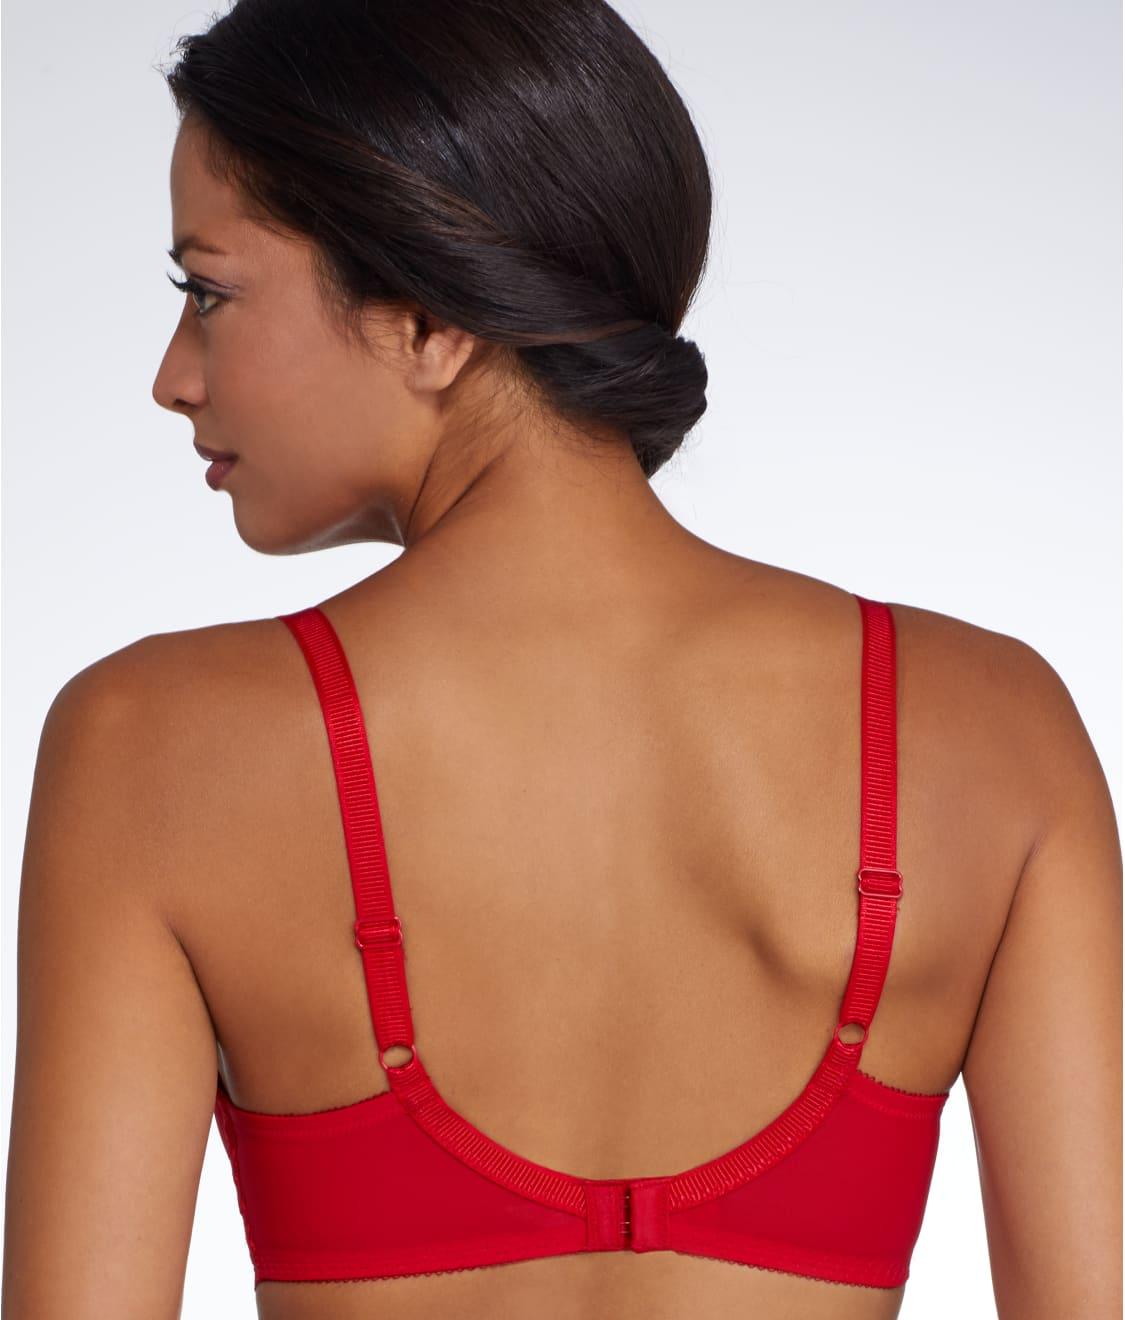 9410f44b4 See La Femme Plunge T-Shirt Bra in Tango Red